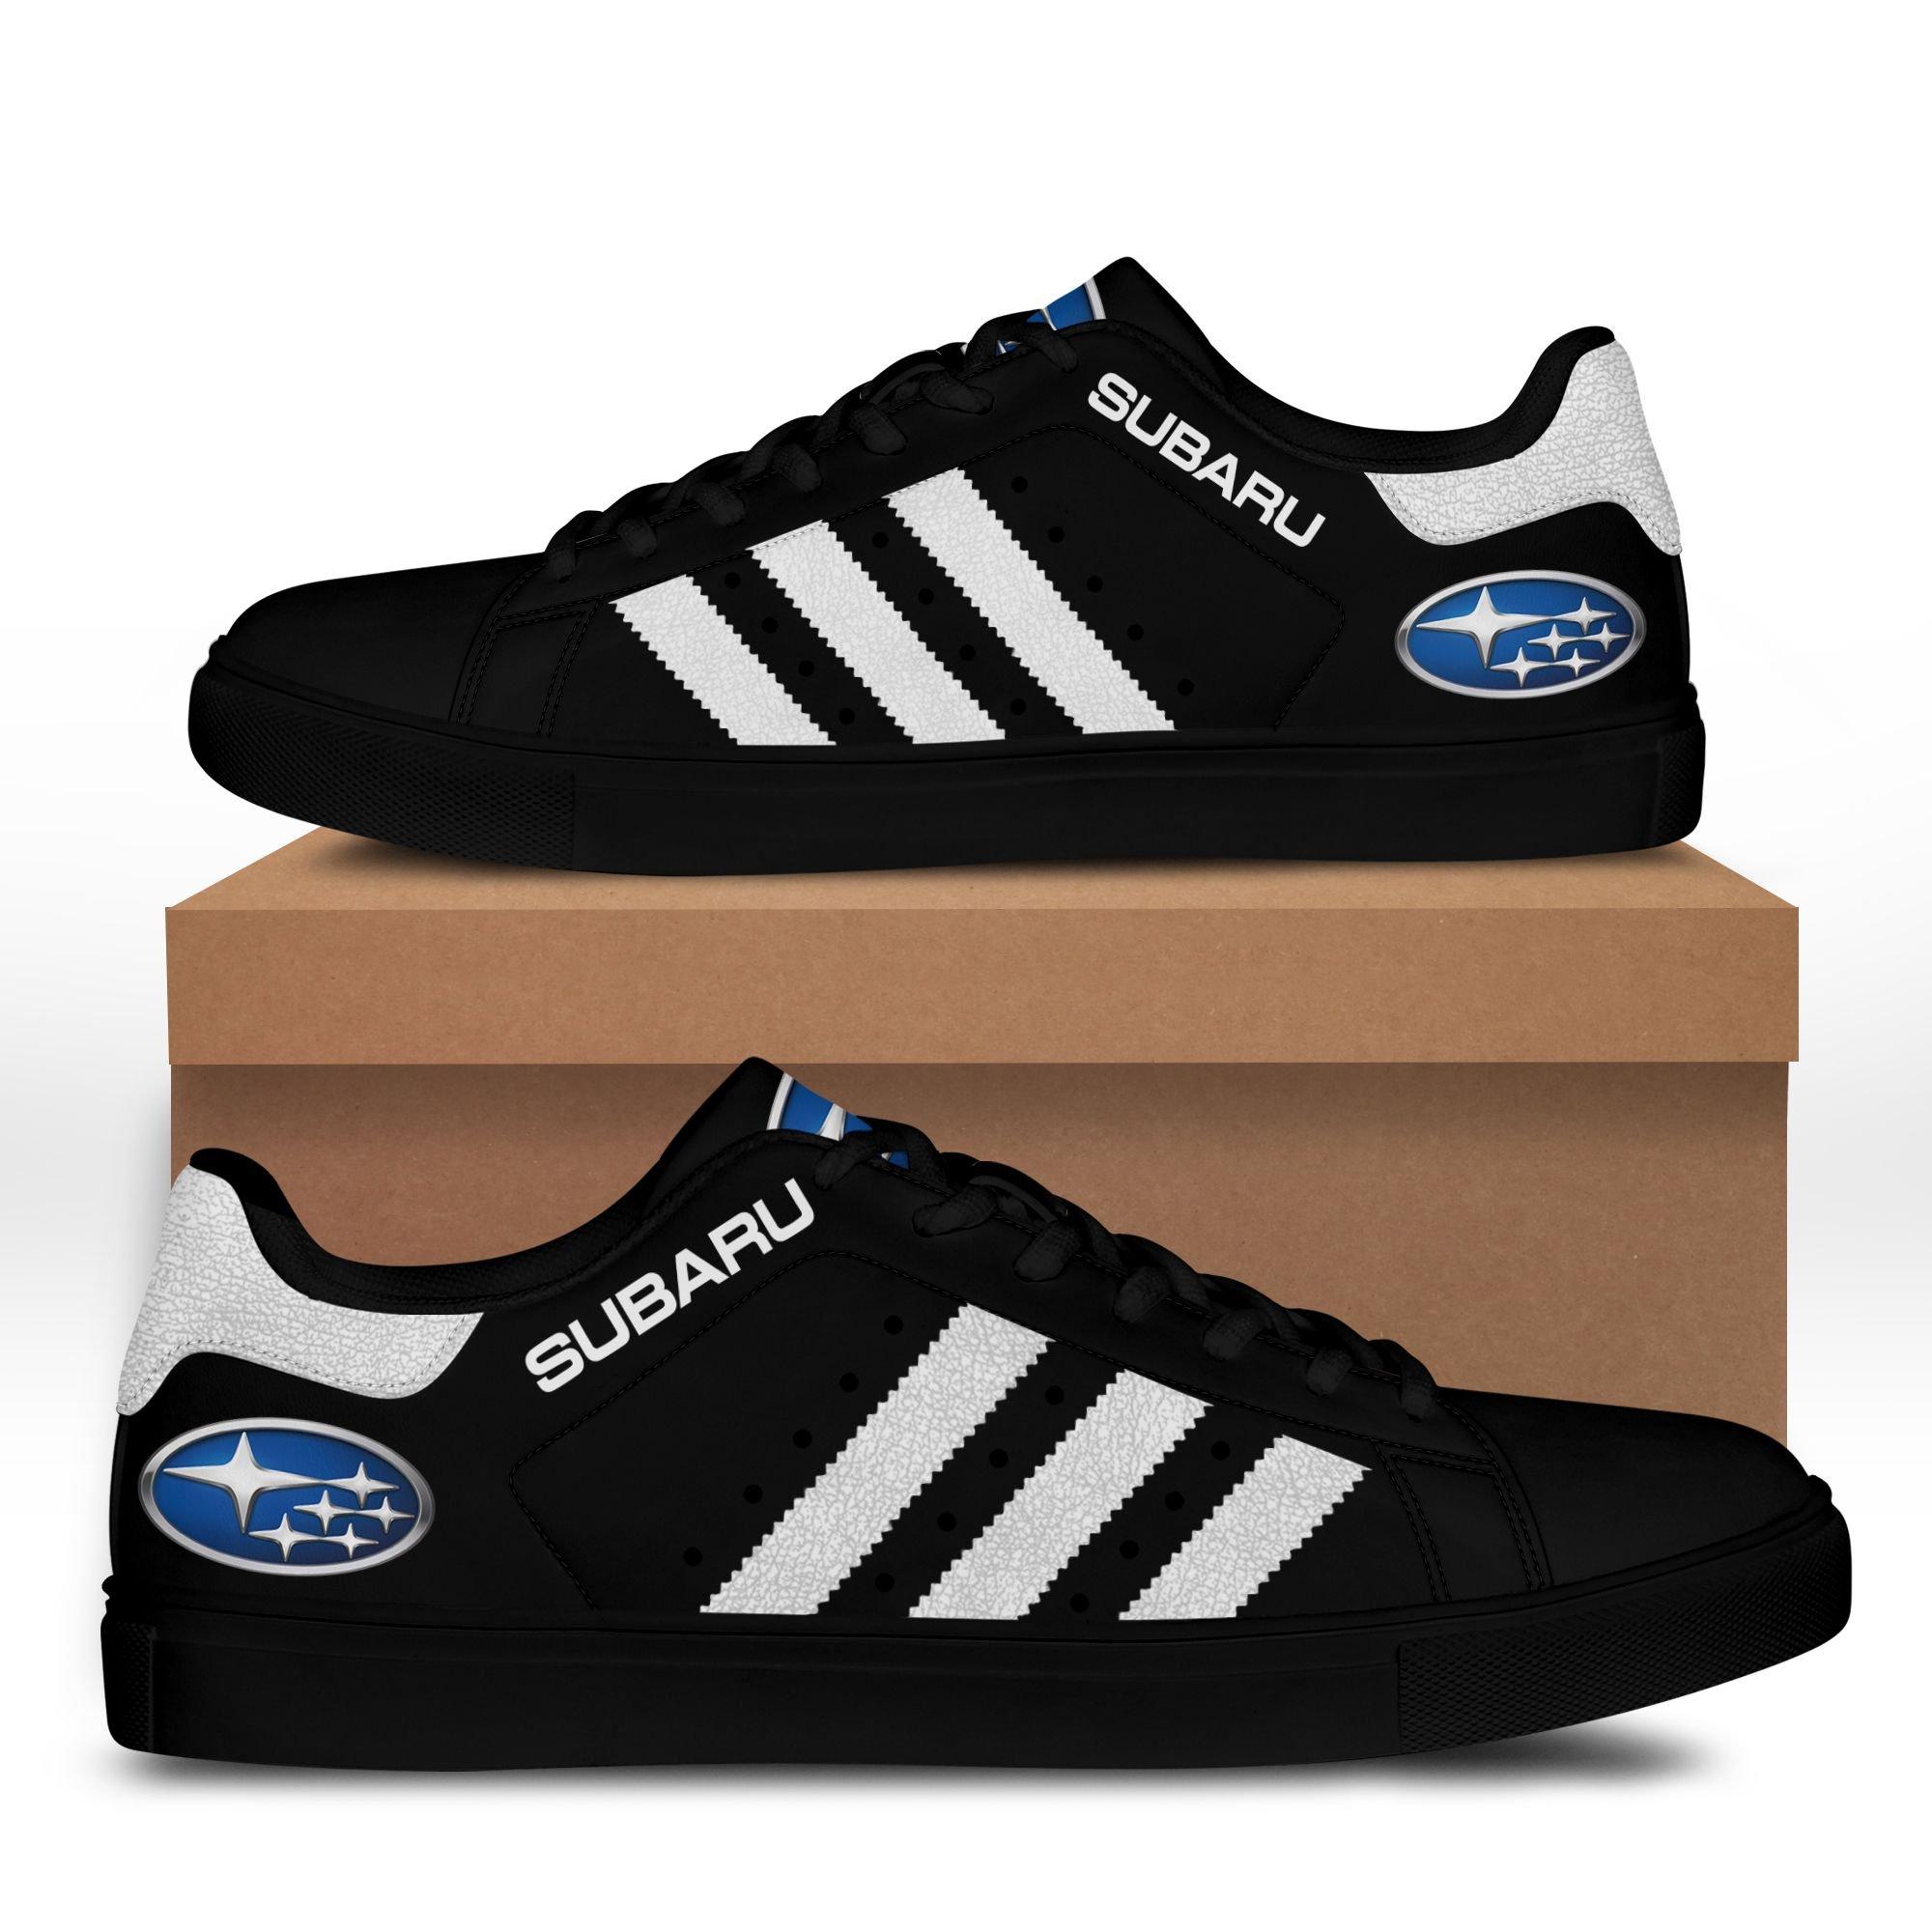 Subaru Black Stan Smith Shoes